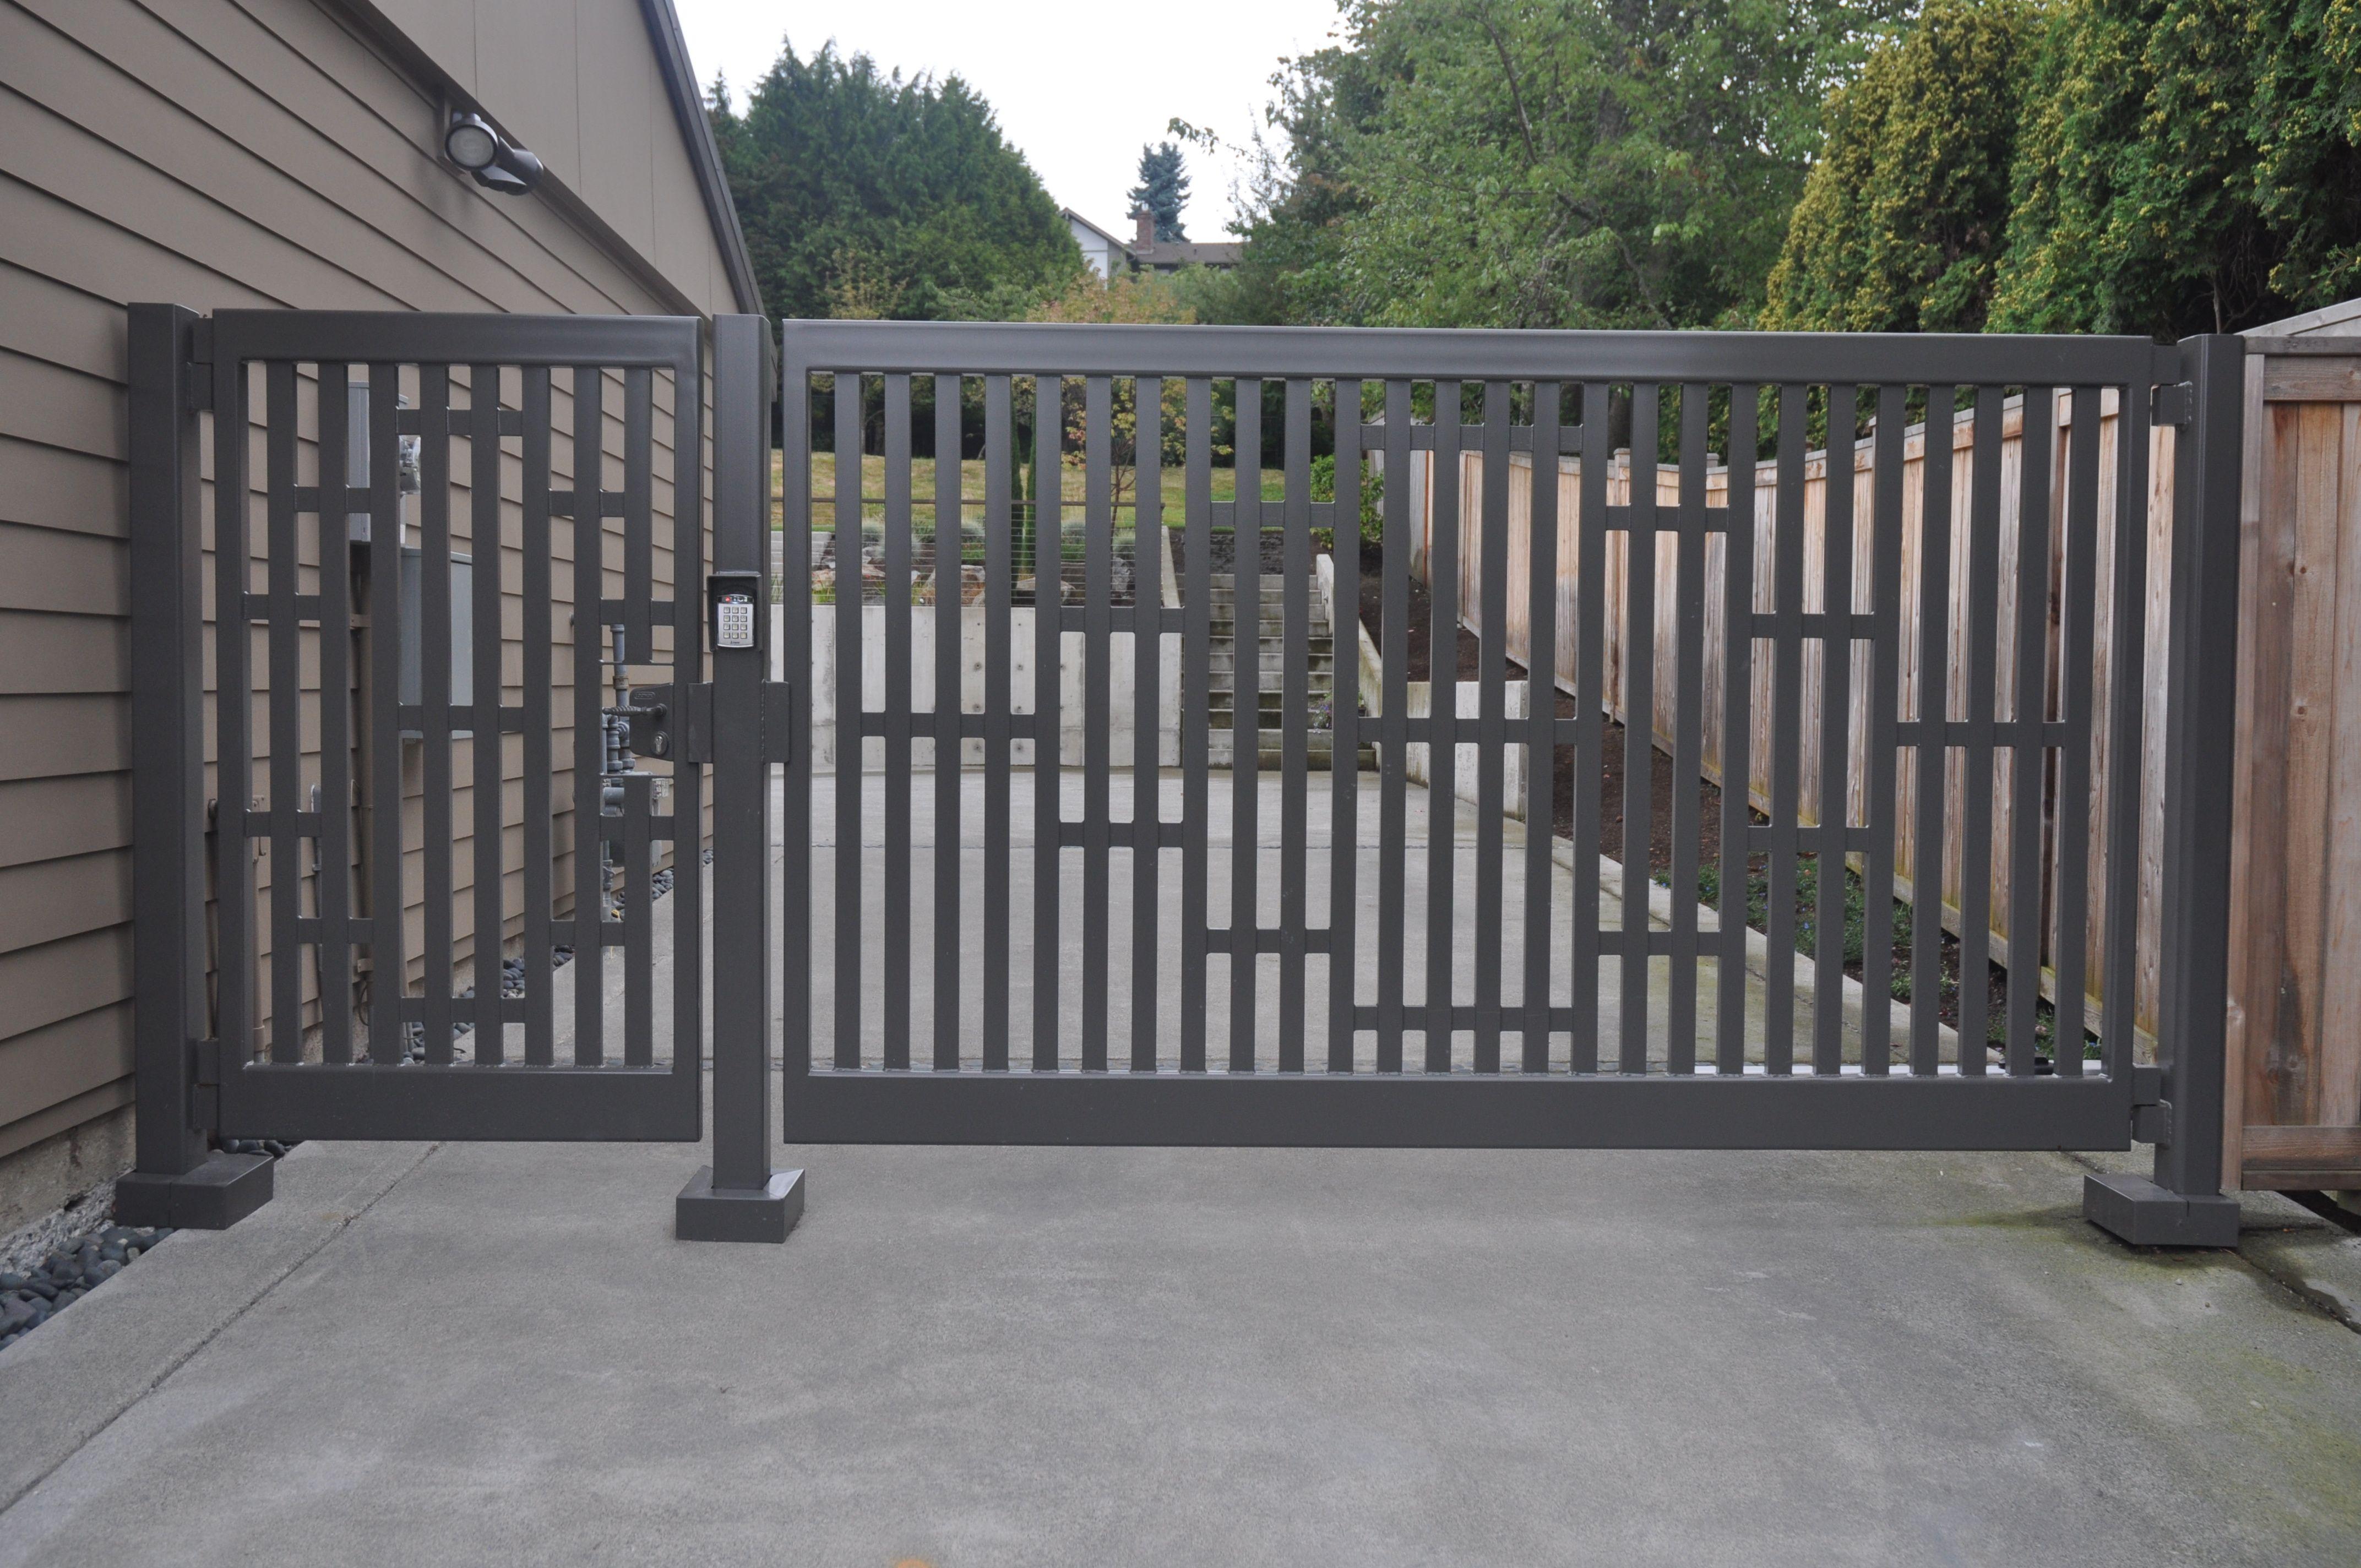 Single Swing Gate With Custom Design Elementatching